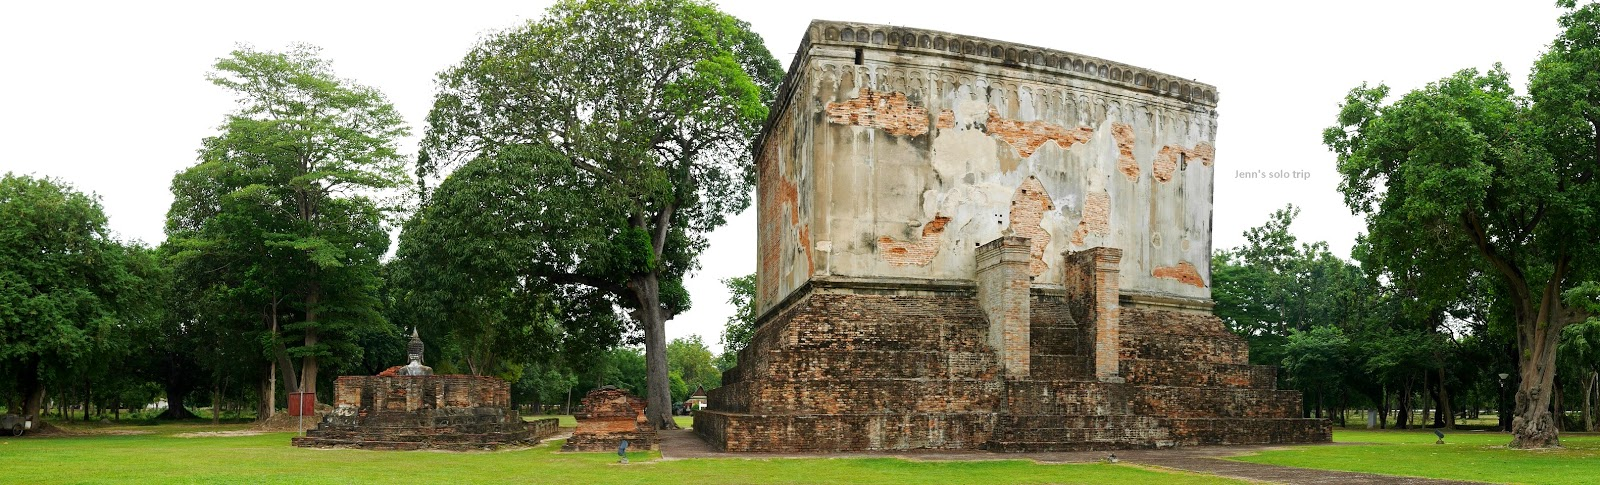 Tastes of Life: Tour around Sukhothai Historical Park by ...